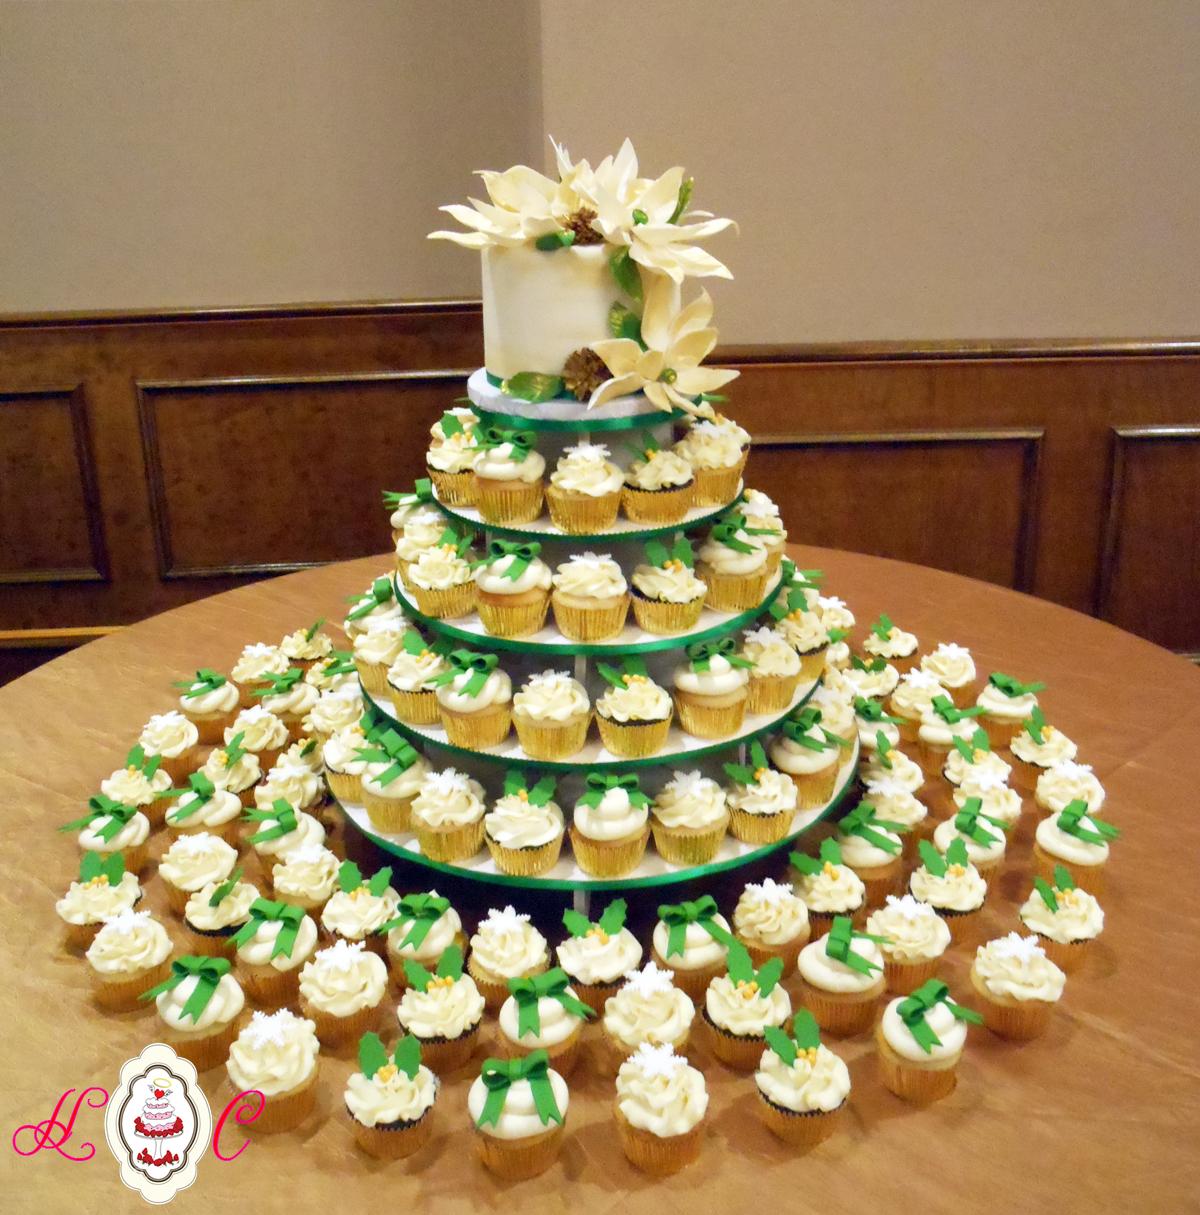 Blue And Green Cupcake Wedding Cake - 5000+ Simple Wedding Cakes